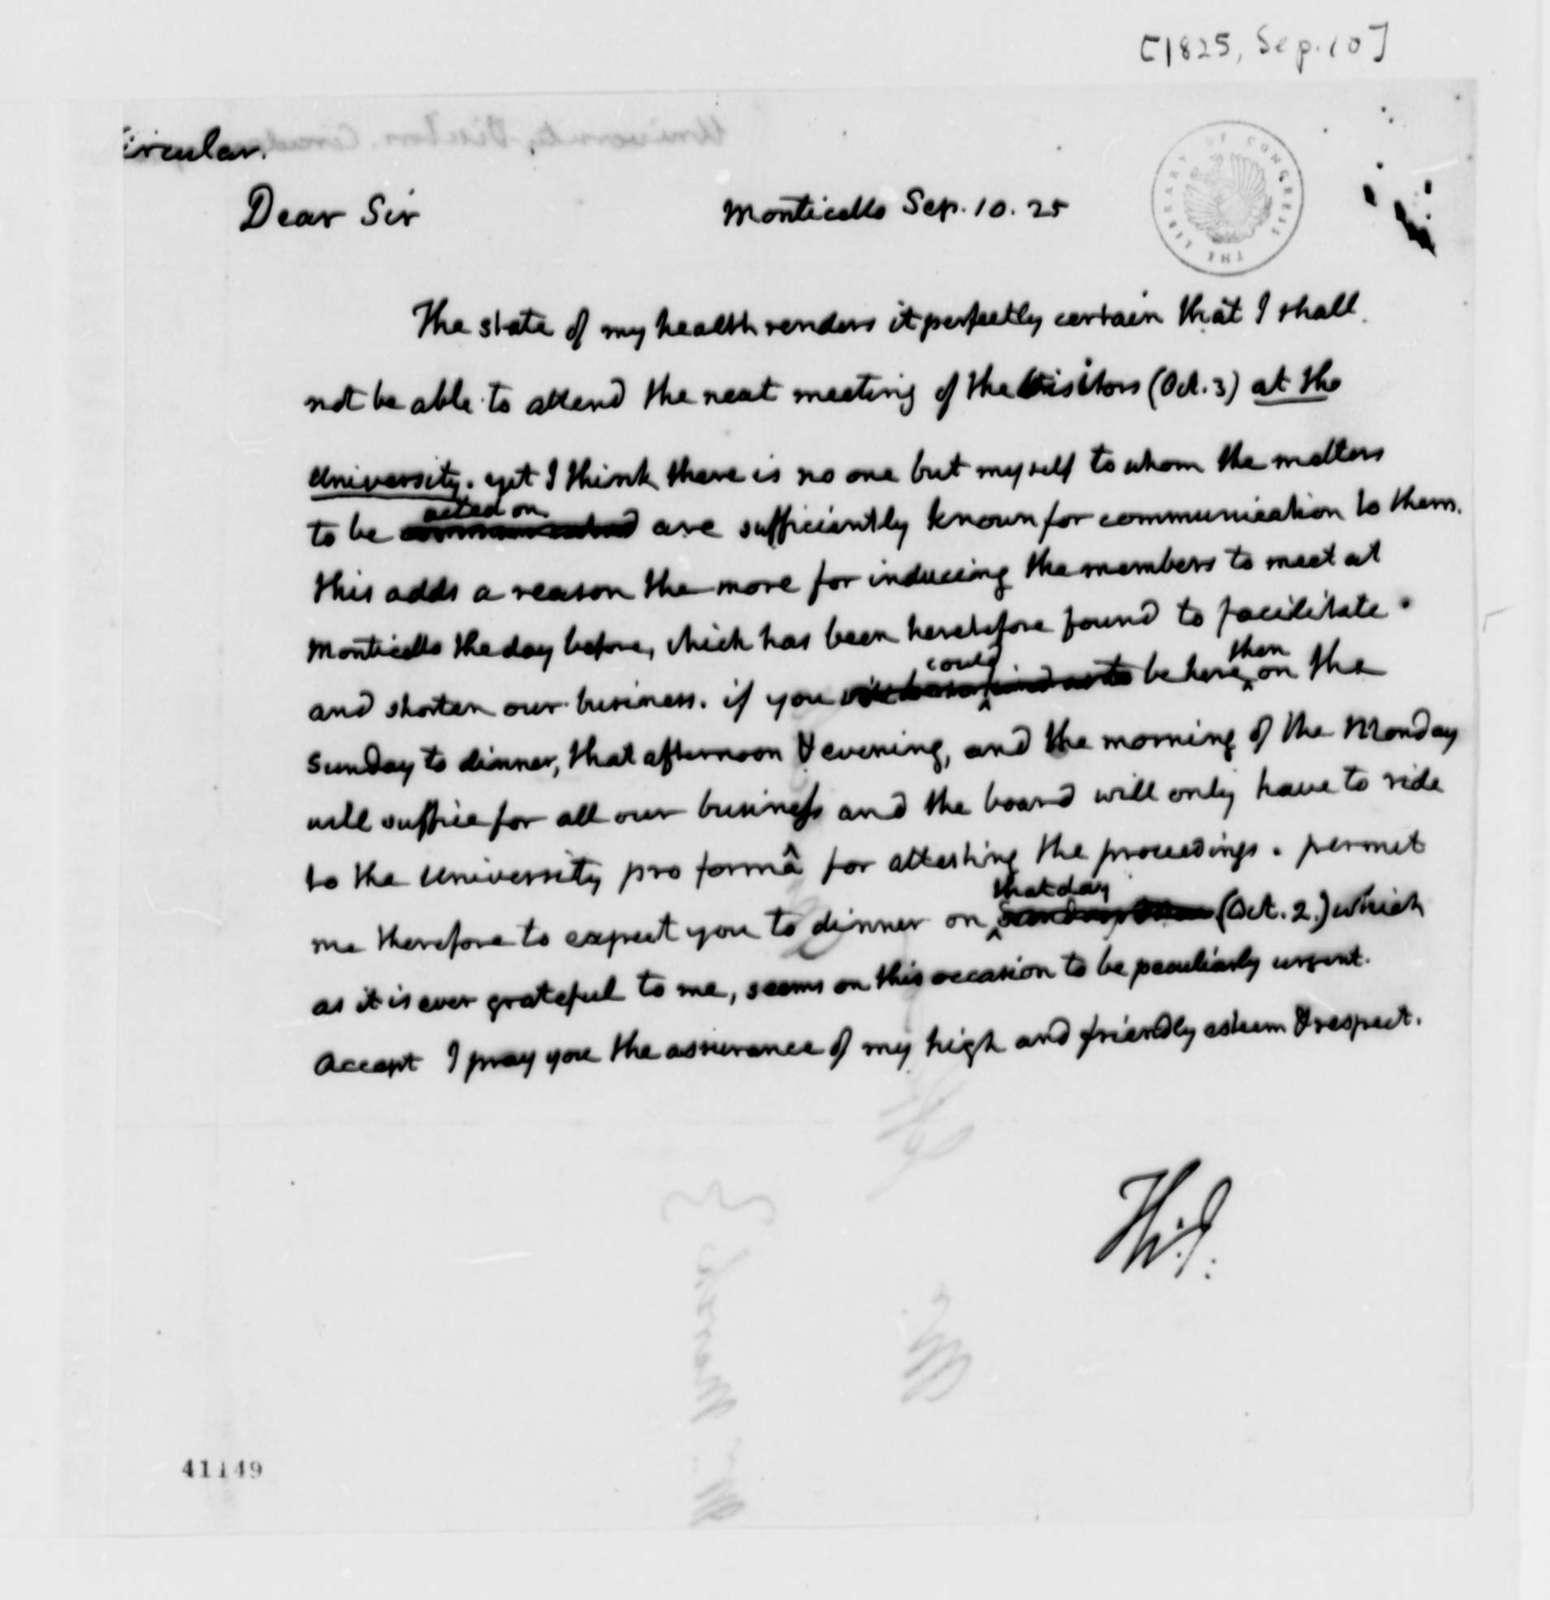 Thomas Jefferson to University of Virginia Board of Visitors, September 10, 1825